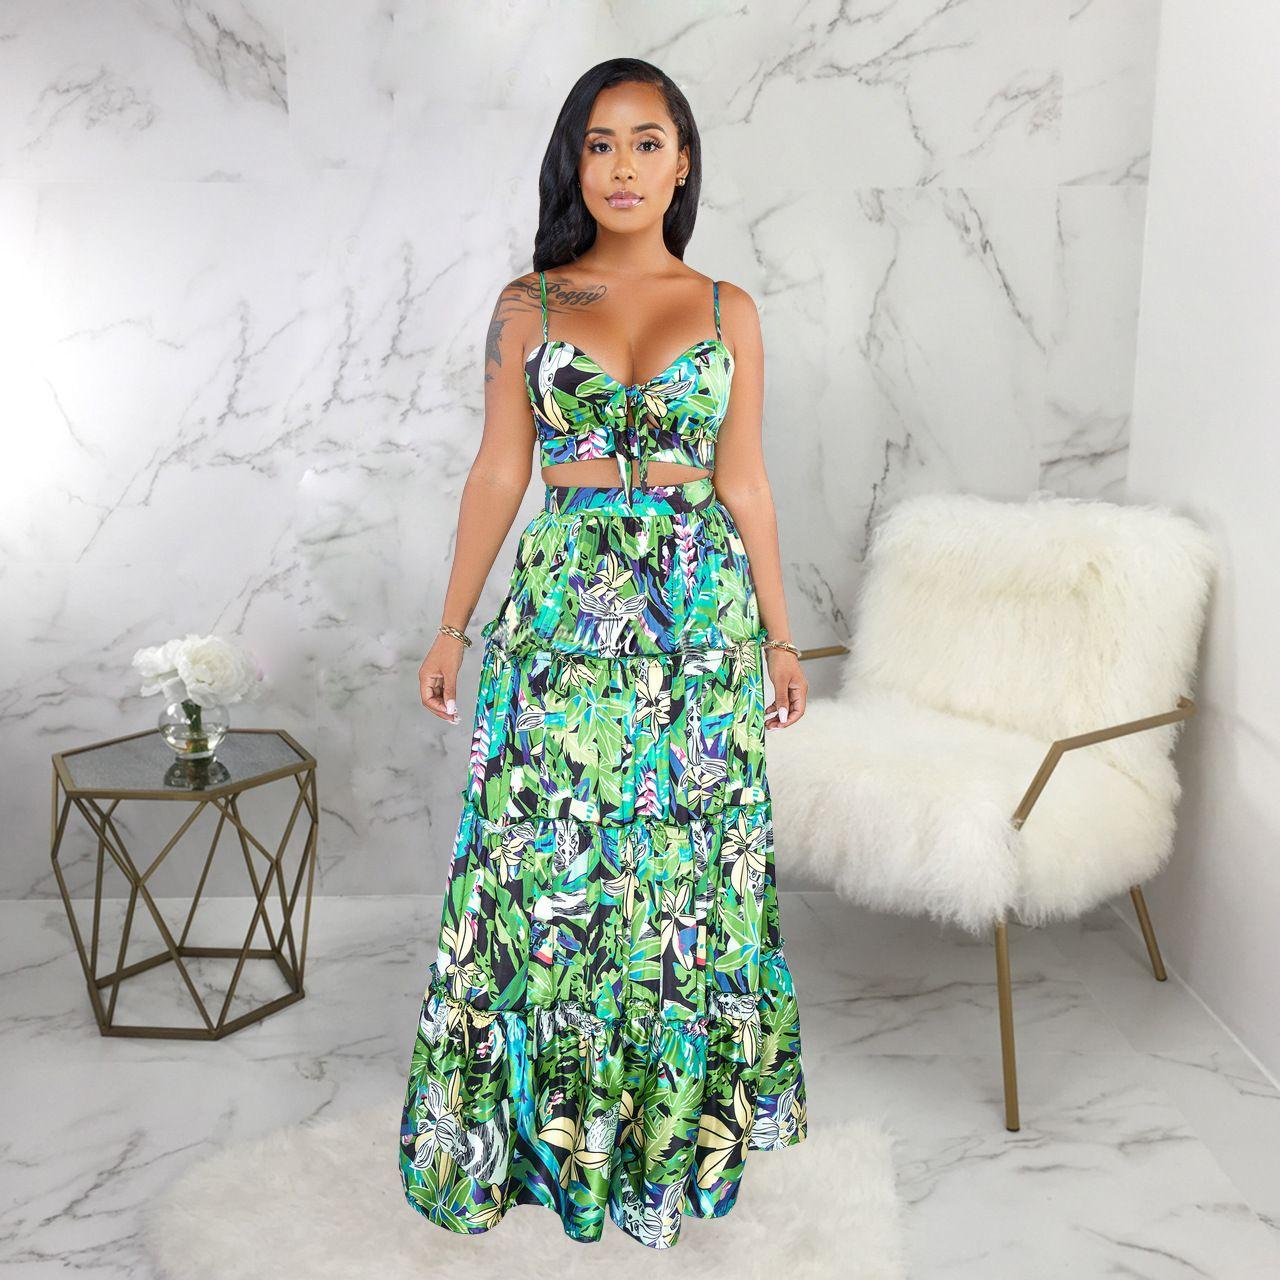 Floral Print Lace Up Maxi Skirt 2 Piece Set Floral Prints Clothes Long Skirt Print Clothes [ 1280 x 1280 Pixel ]